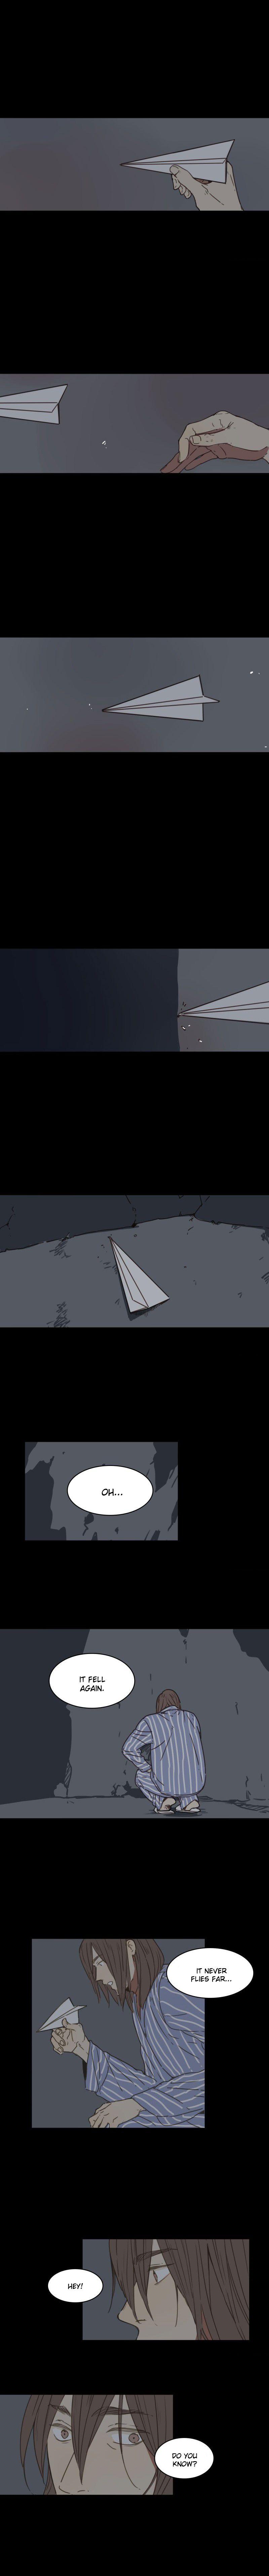 https://im.nineanime.com/comics/pic9/57/20473/498004/57135dc5c8a0cfad99e7bbf61e27cb1d.jpg Page 1